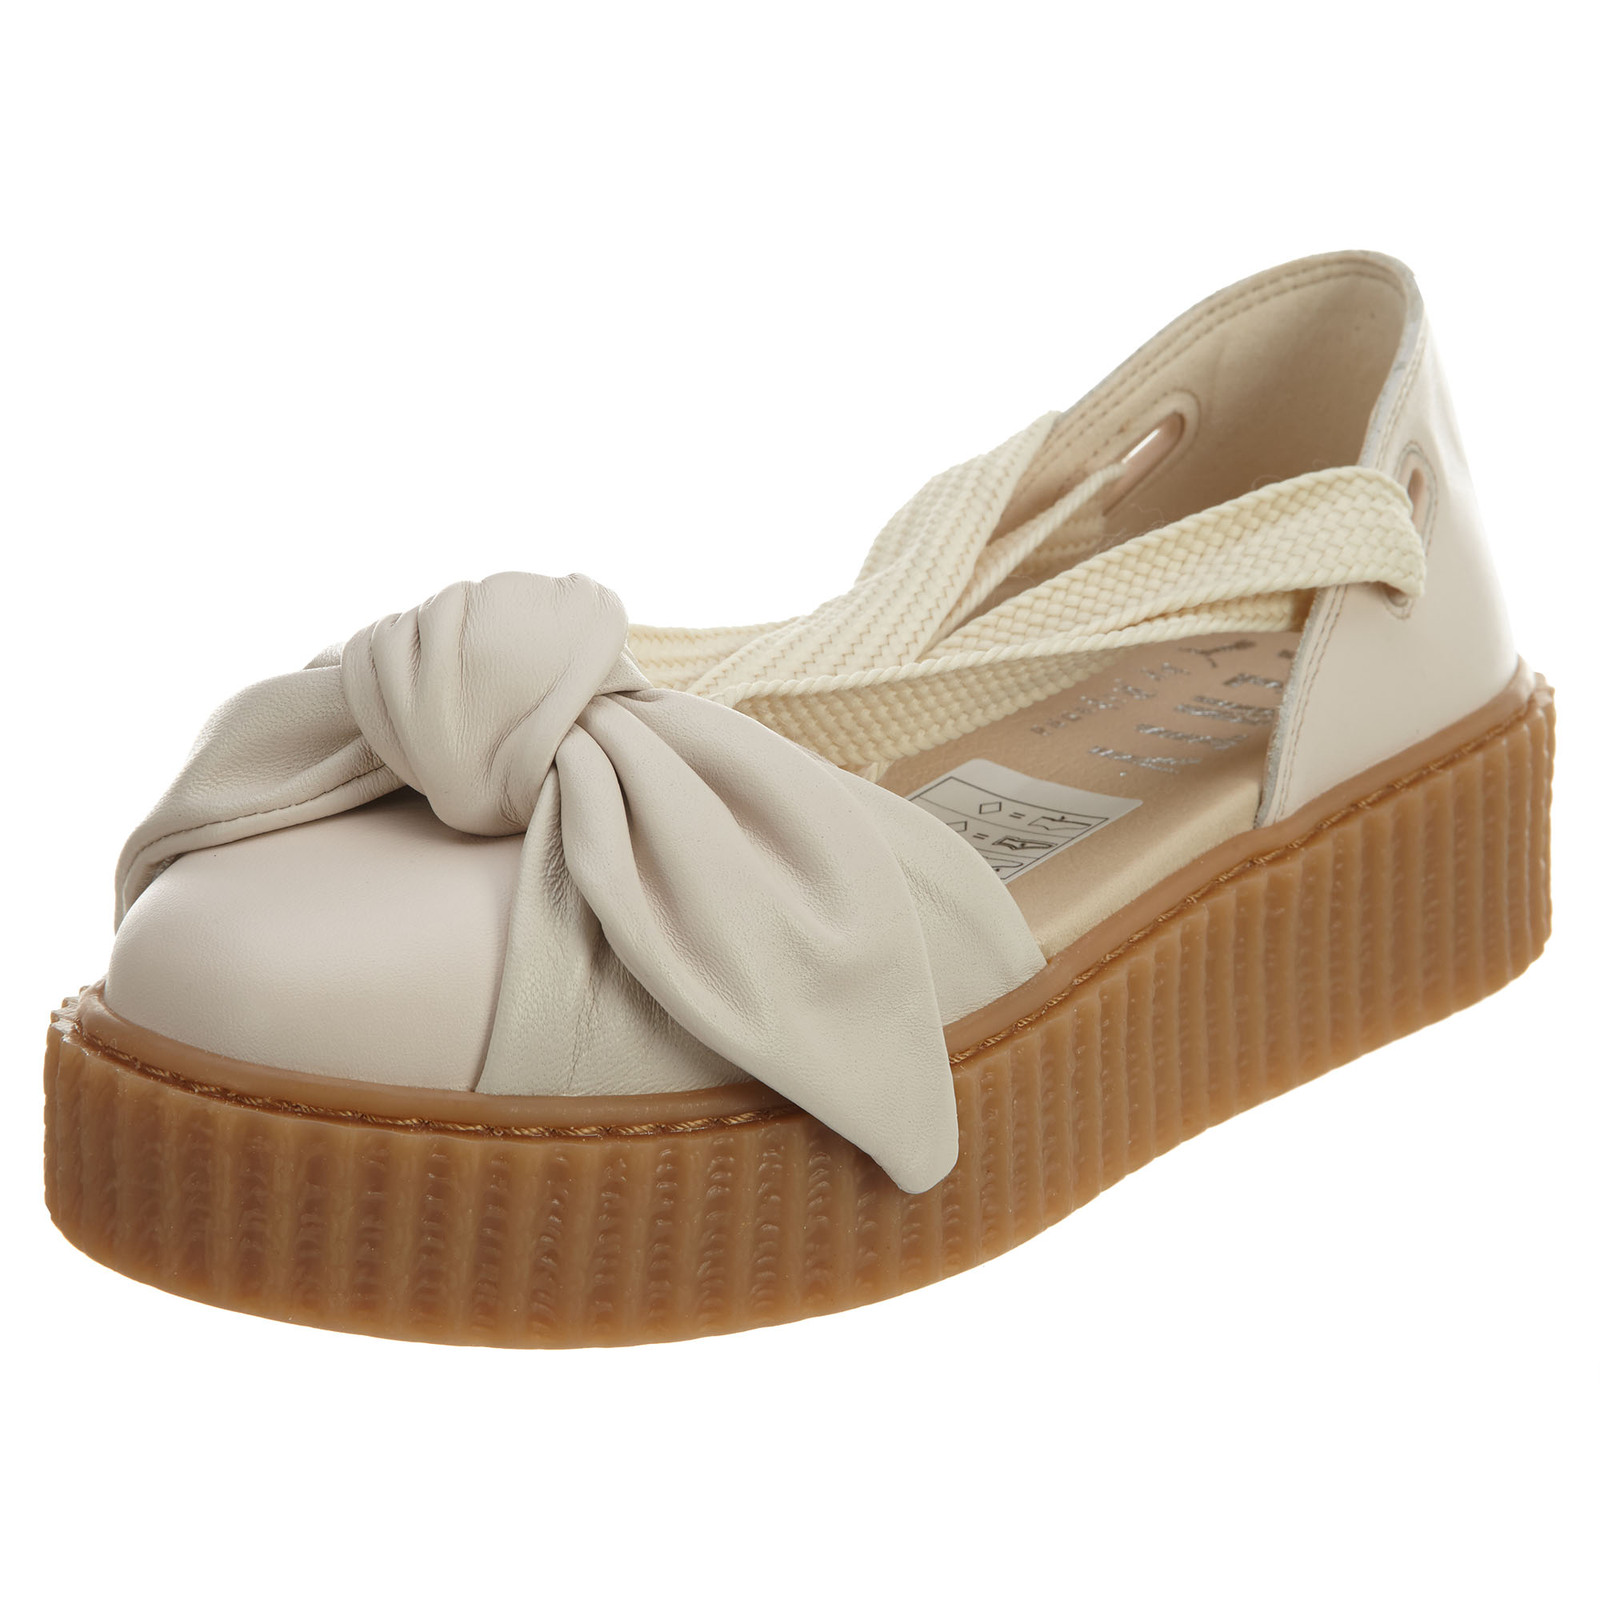 129762512274 1496998171puma 365794 02 1. 1496998171puma 365794 02 1. Previous. Puma Bow  Creeper Sandal Womens Style ...